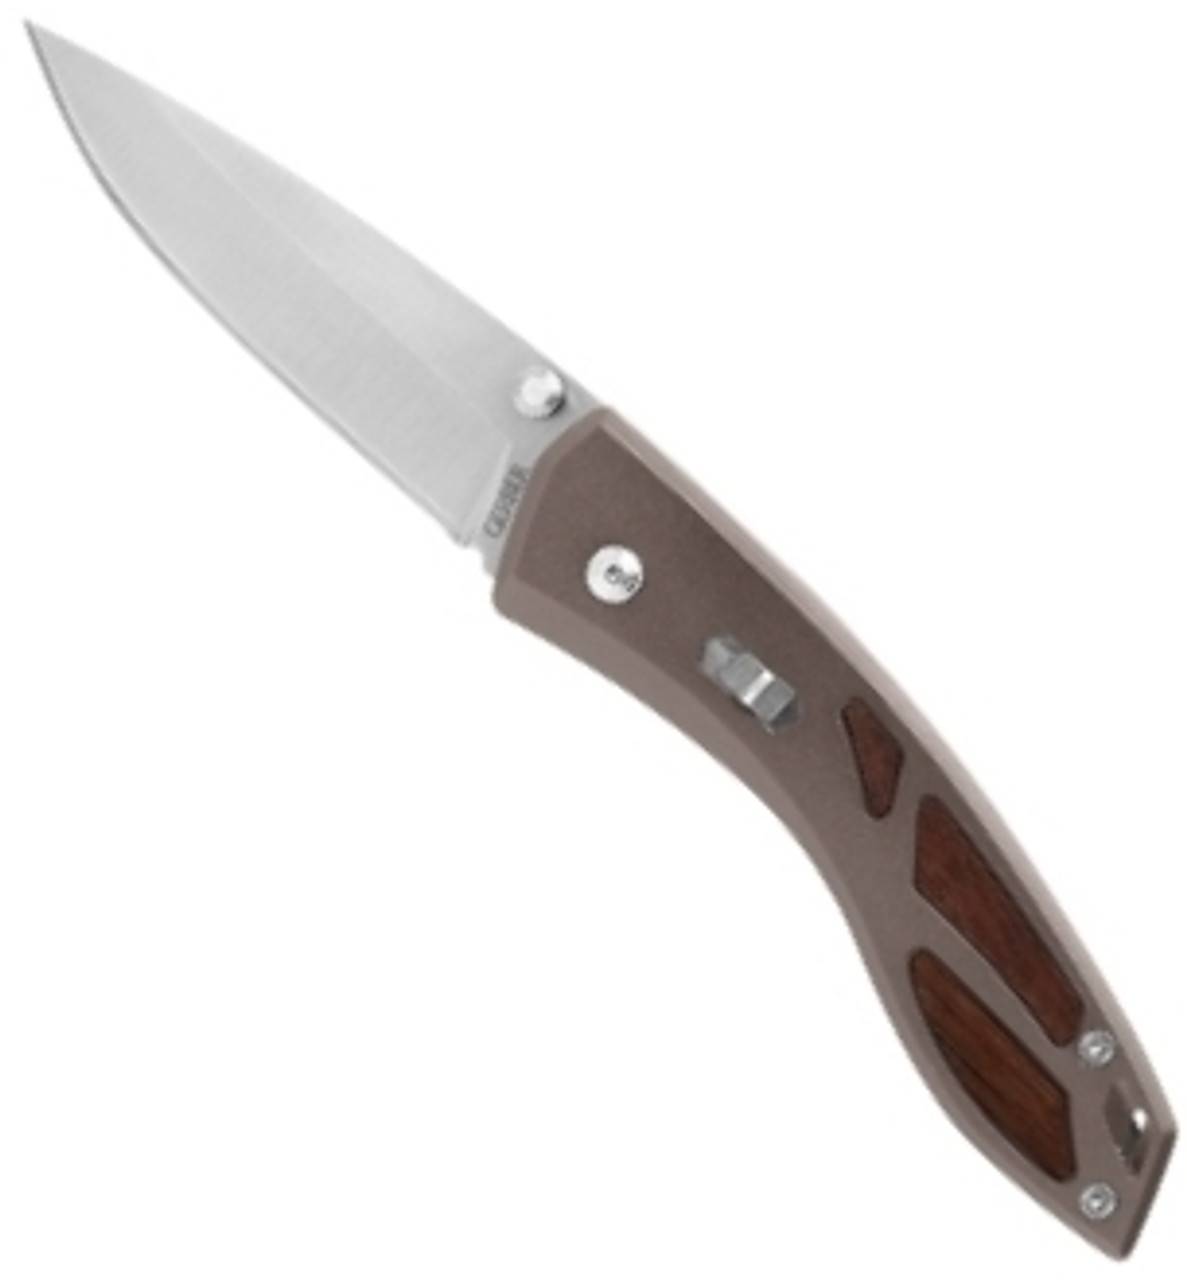 Gerber Statesman F.A.S.T. Assist Open Knife, Fine Edge, G0166